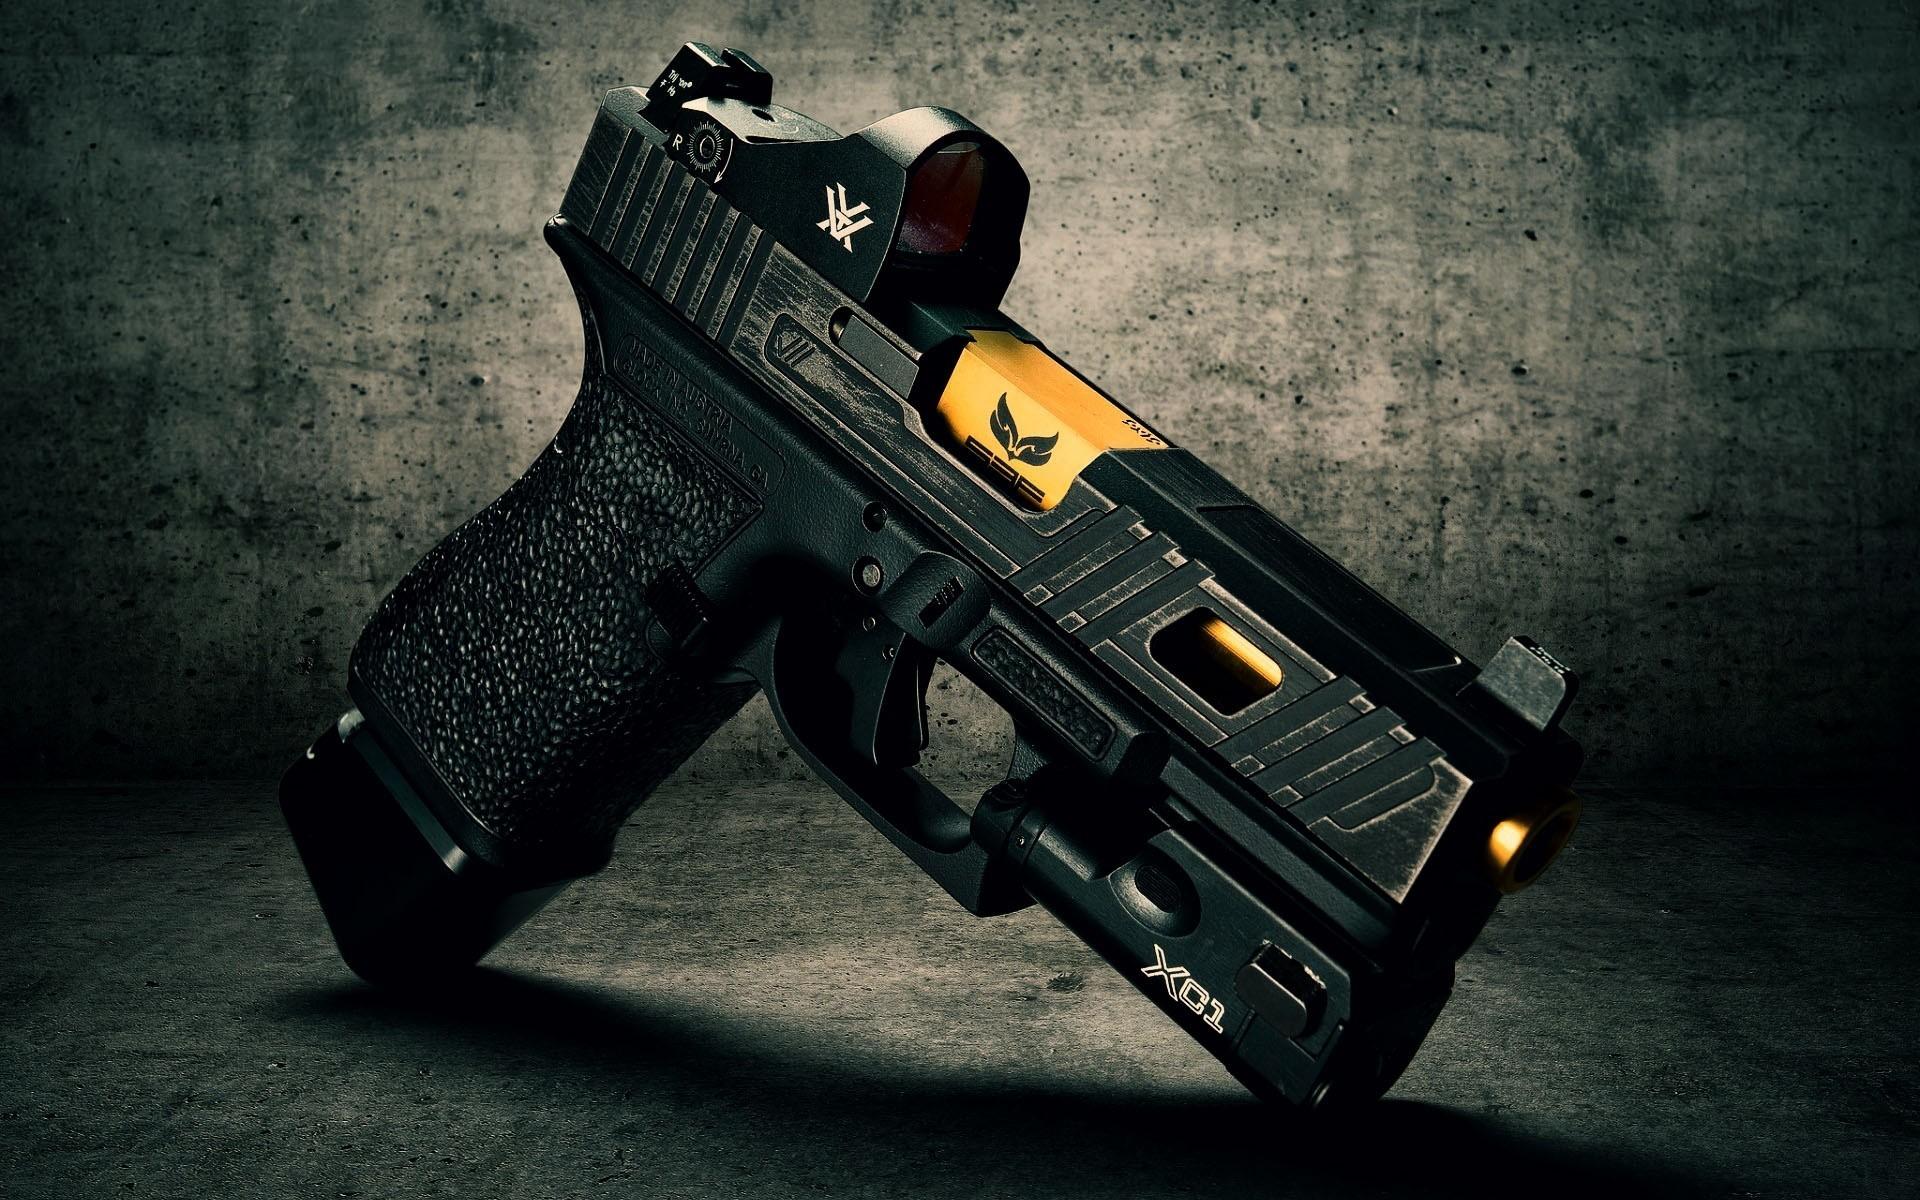 Glock 17 Wallpaper 71 Images